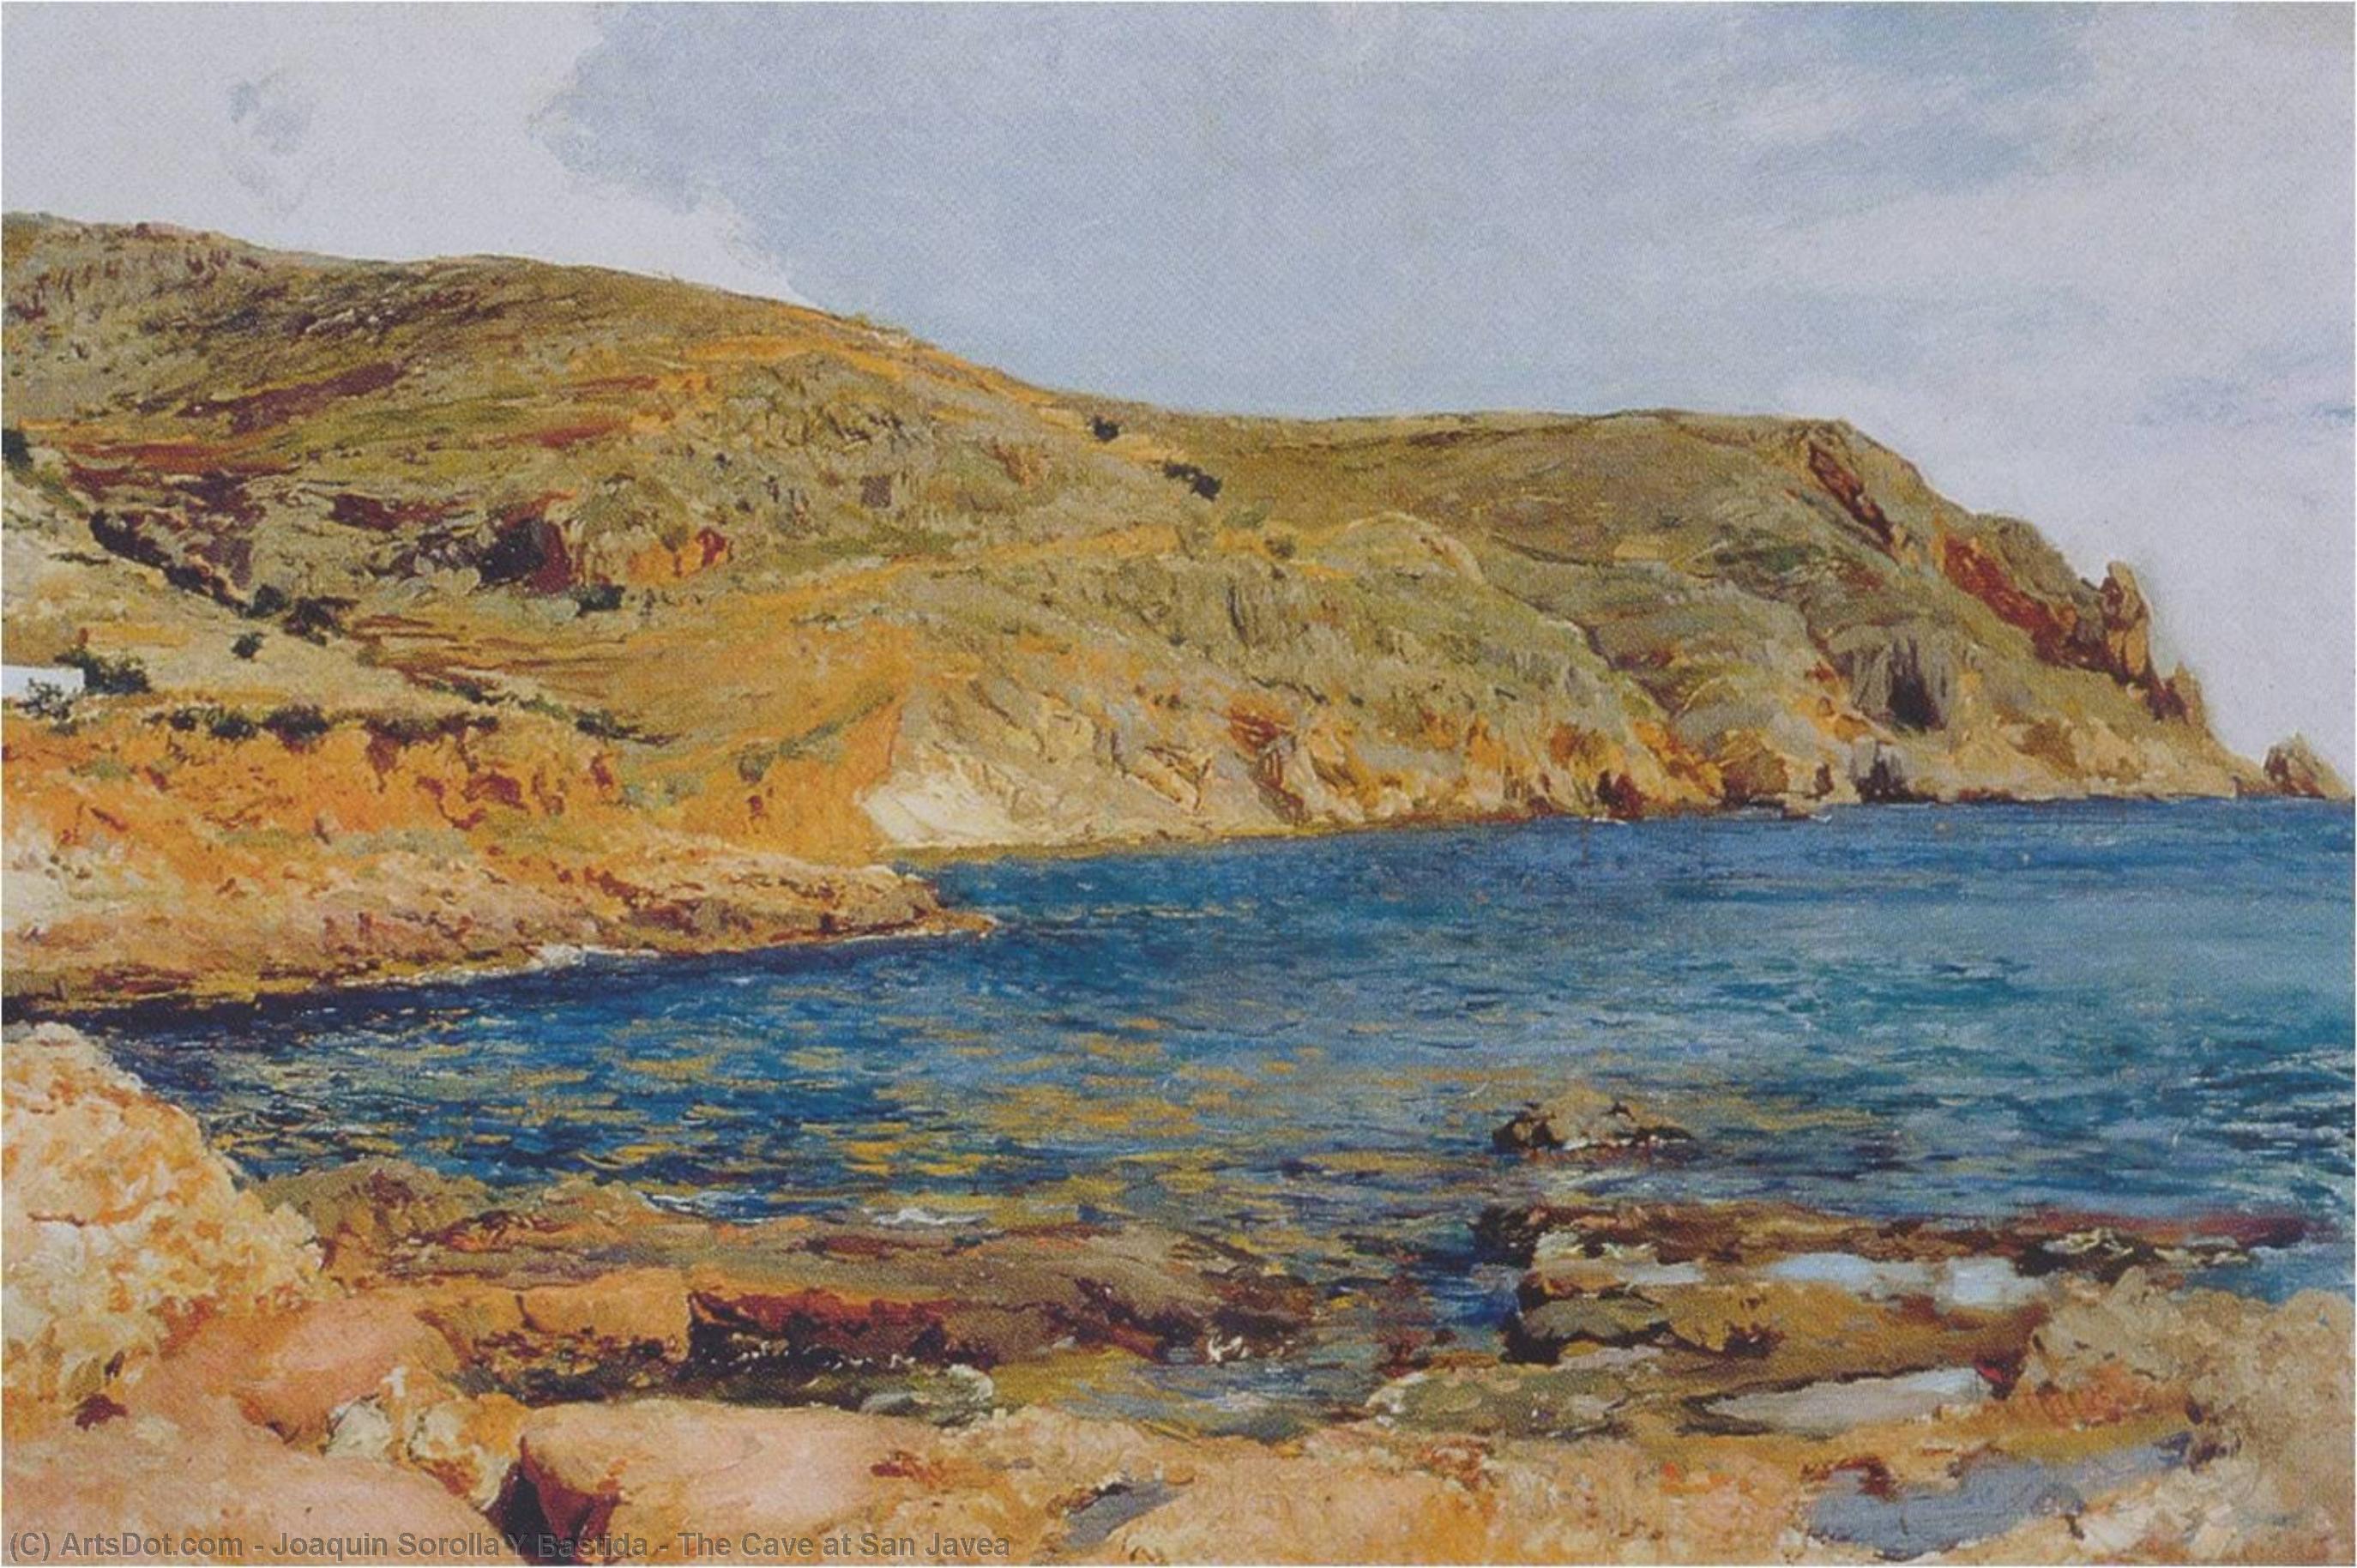 Joaquin-sorolla-y-bastida-the-cave-at-san-javea